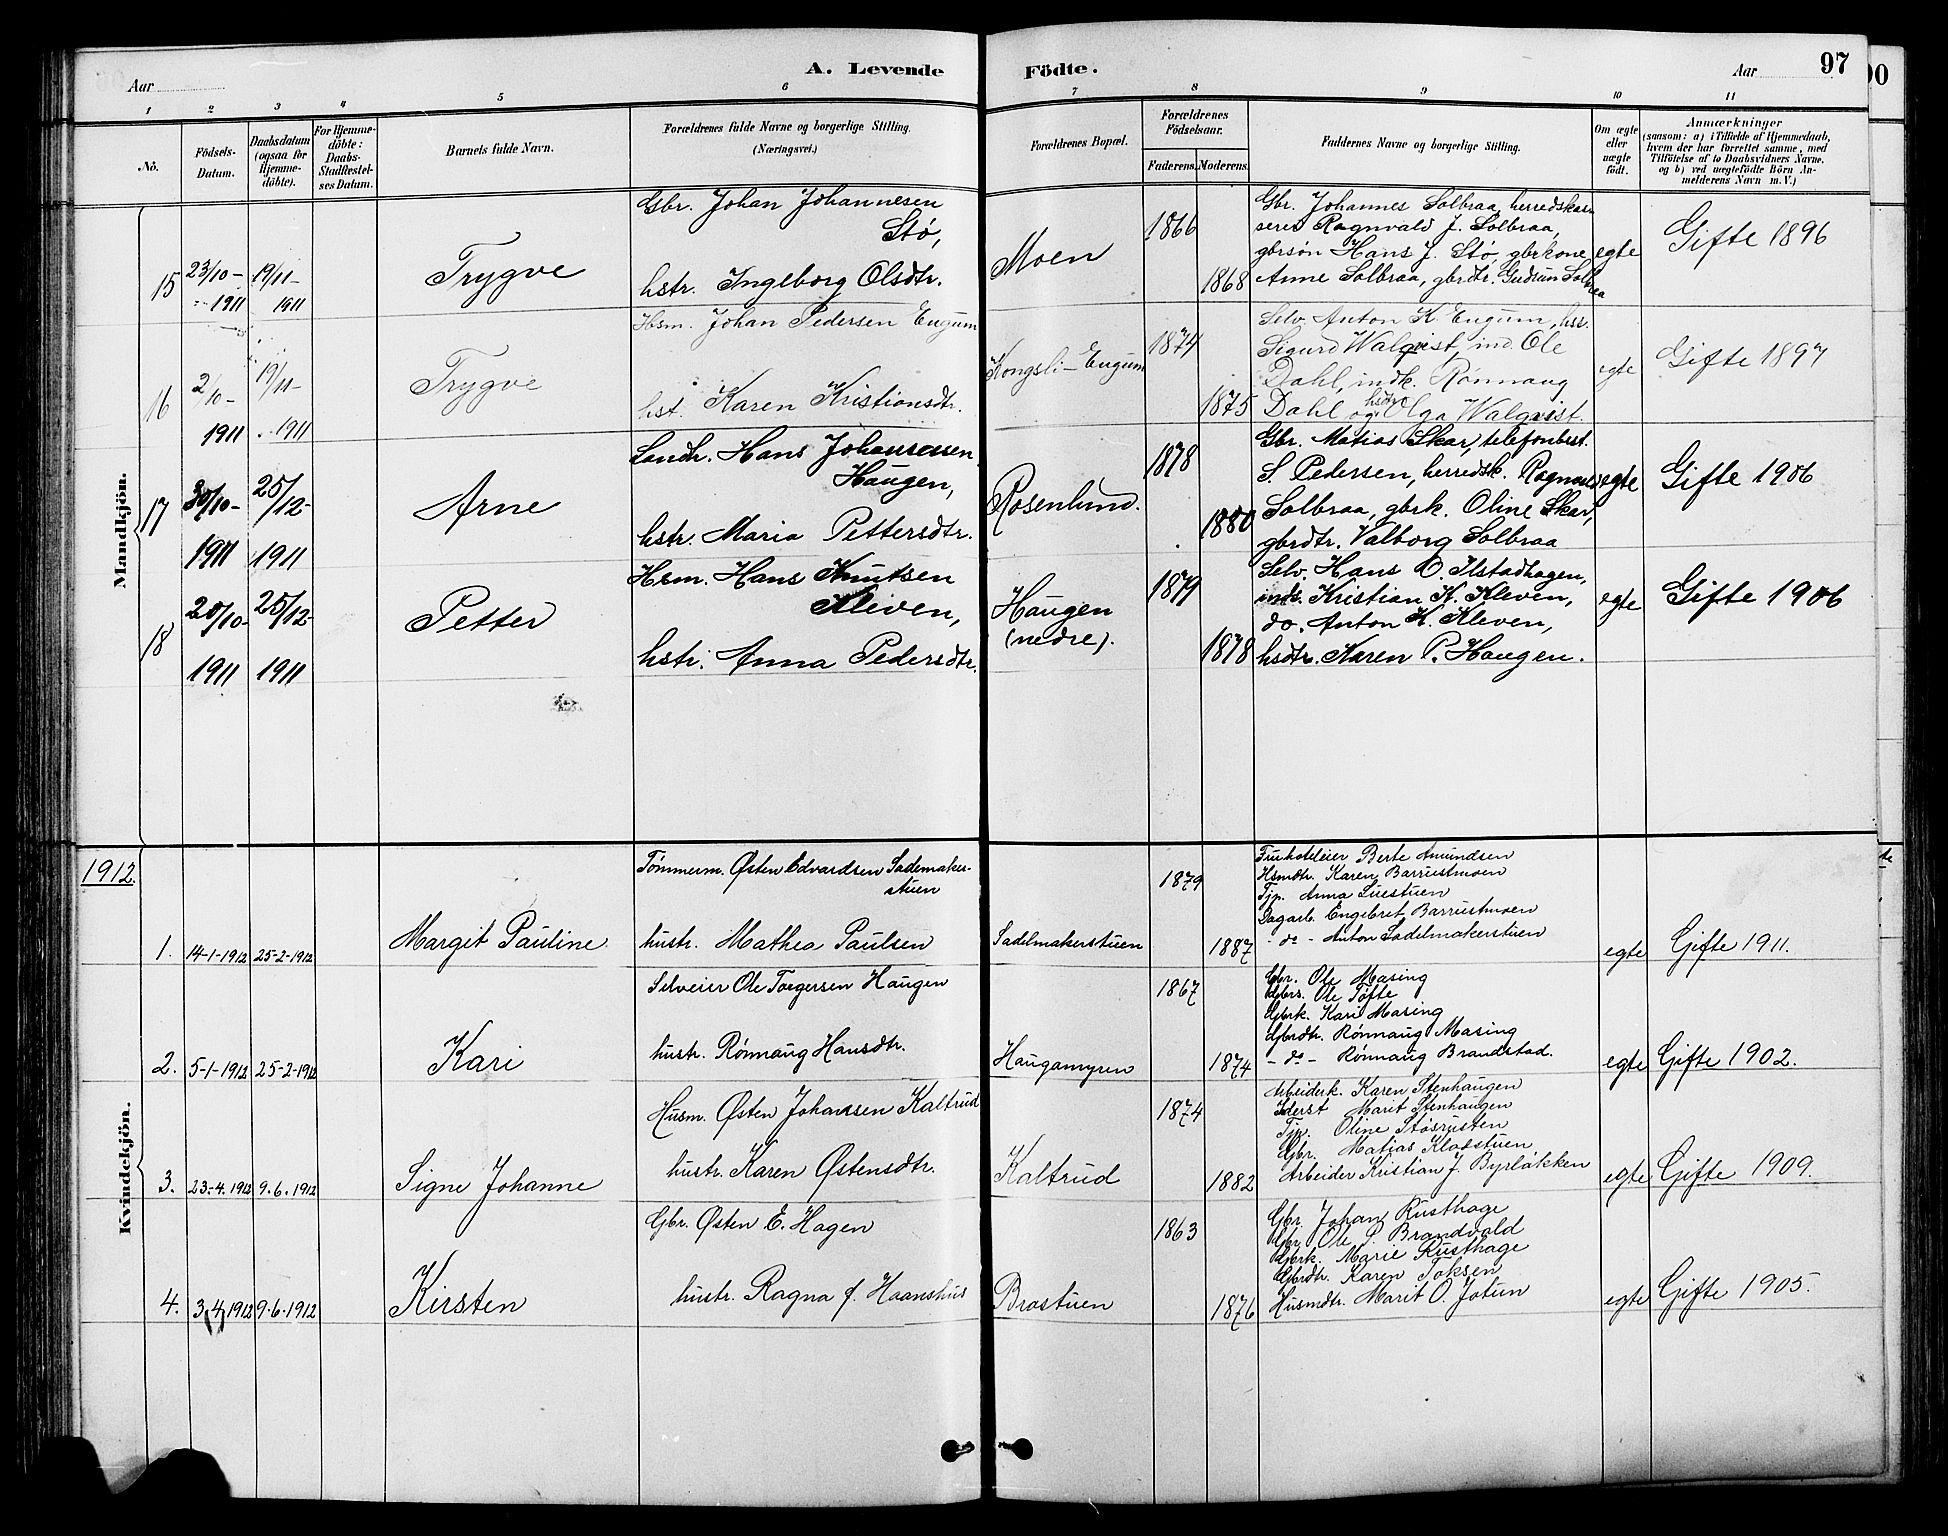 SAH, Nord-Fron prestekontor, Klokkerbok nr. 4, 1884-1914, s. 97